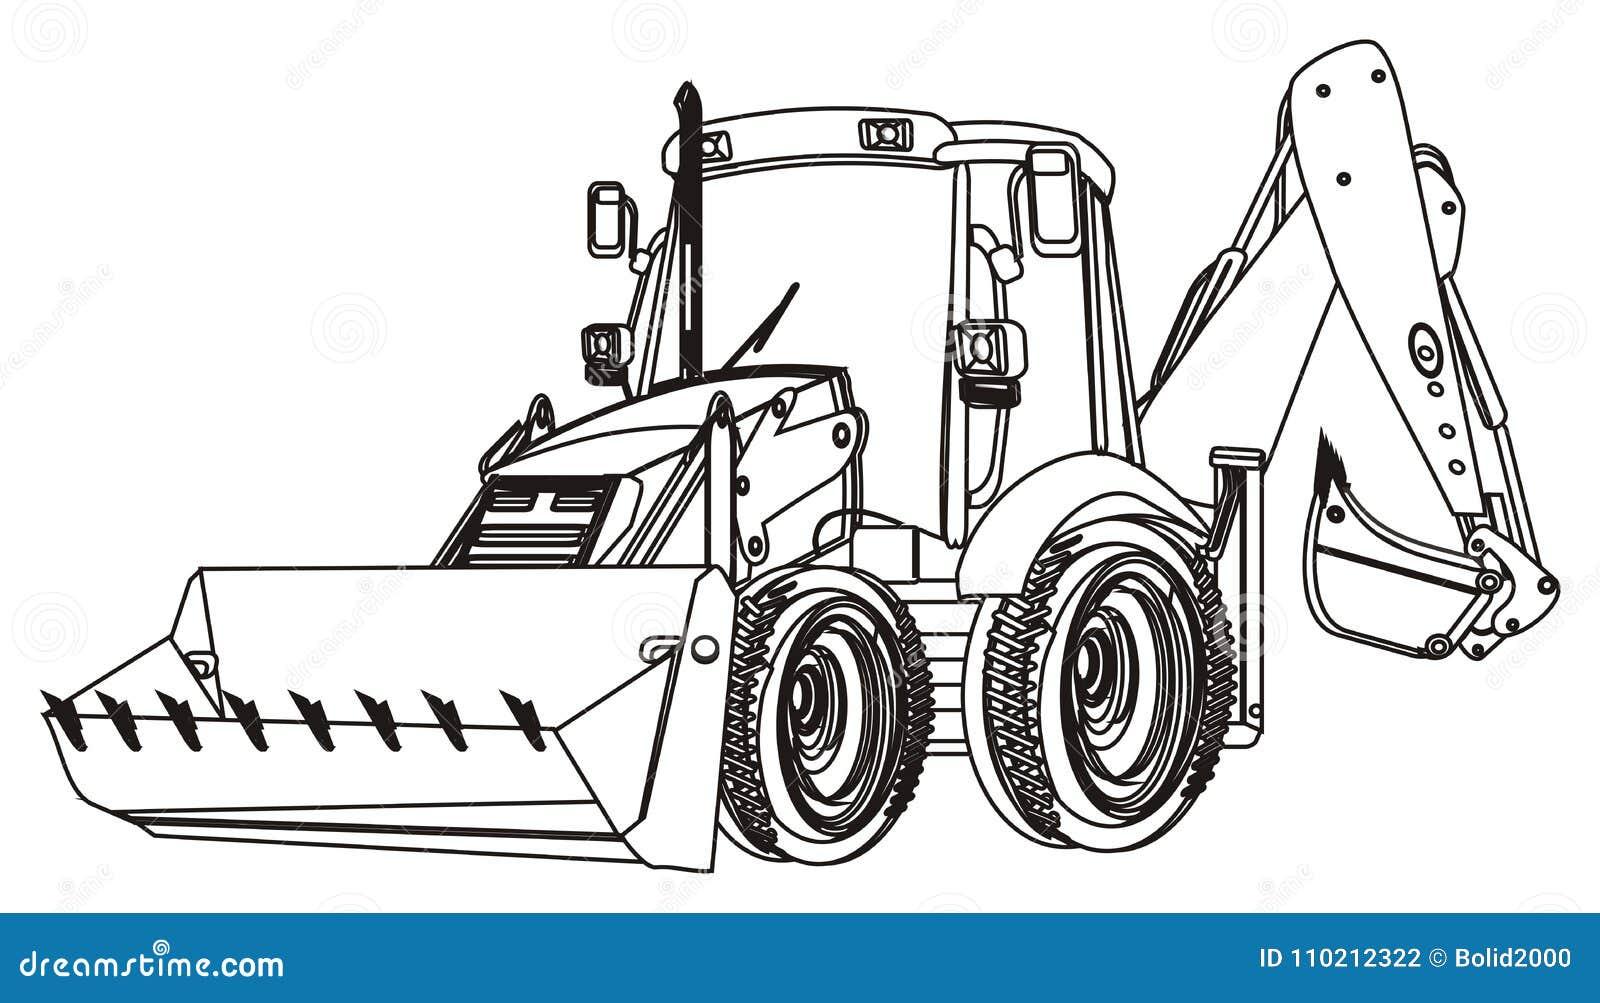 Uma Maquina Escavadora Colorindo Ilustracao Stock Ilustracao De